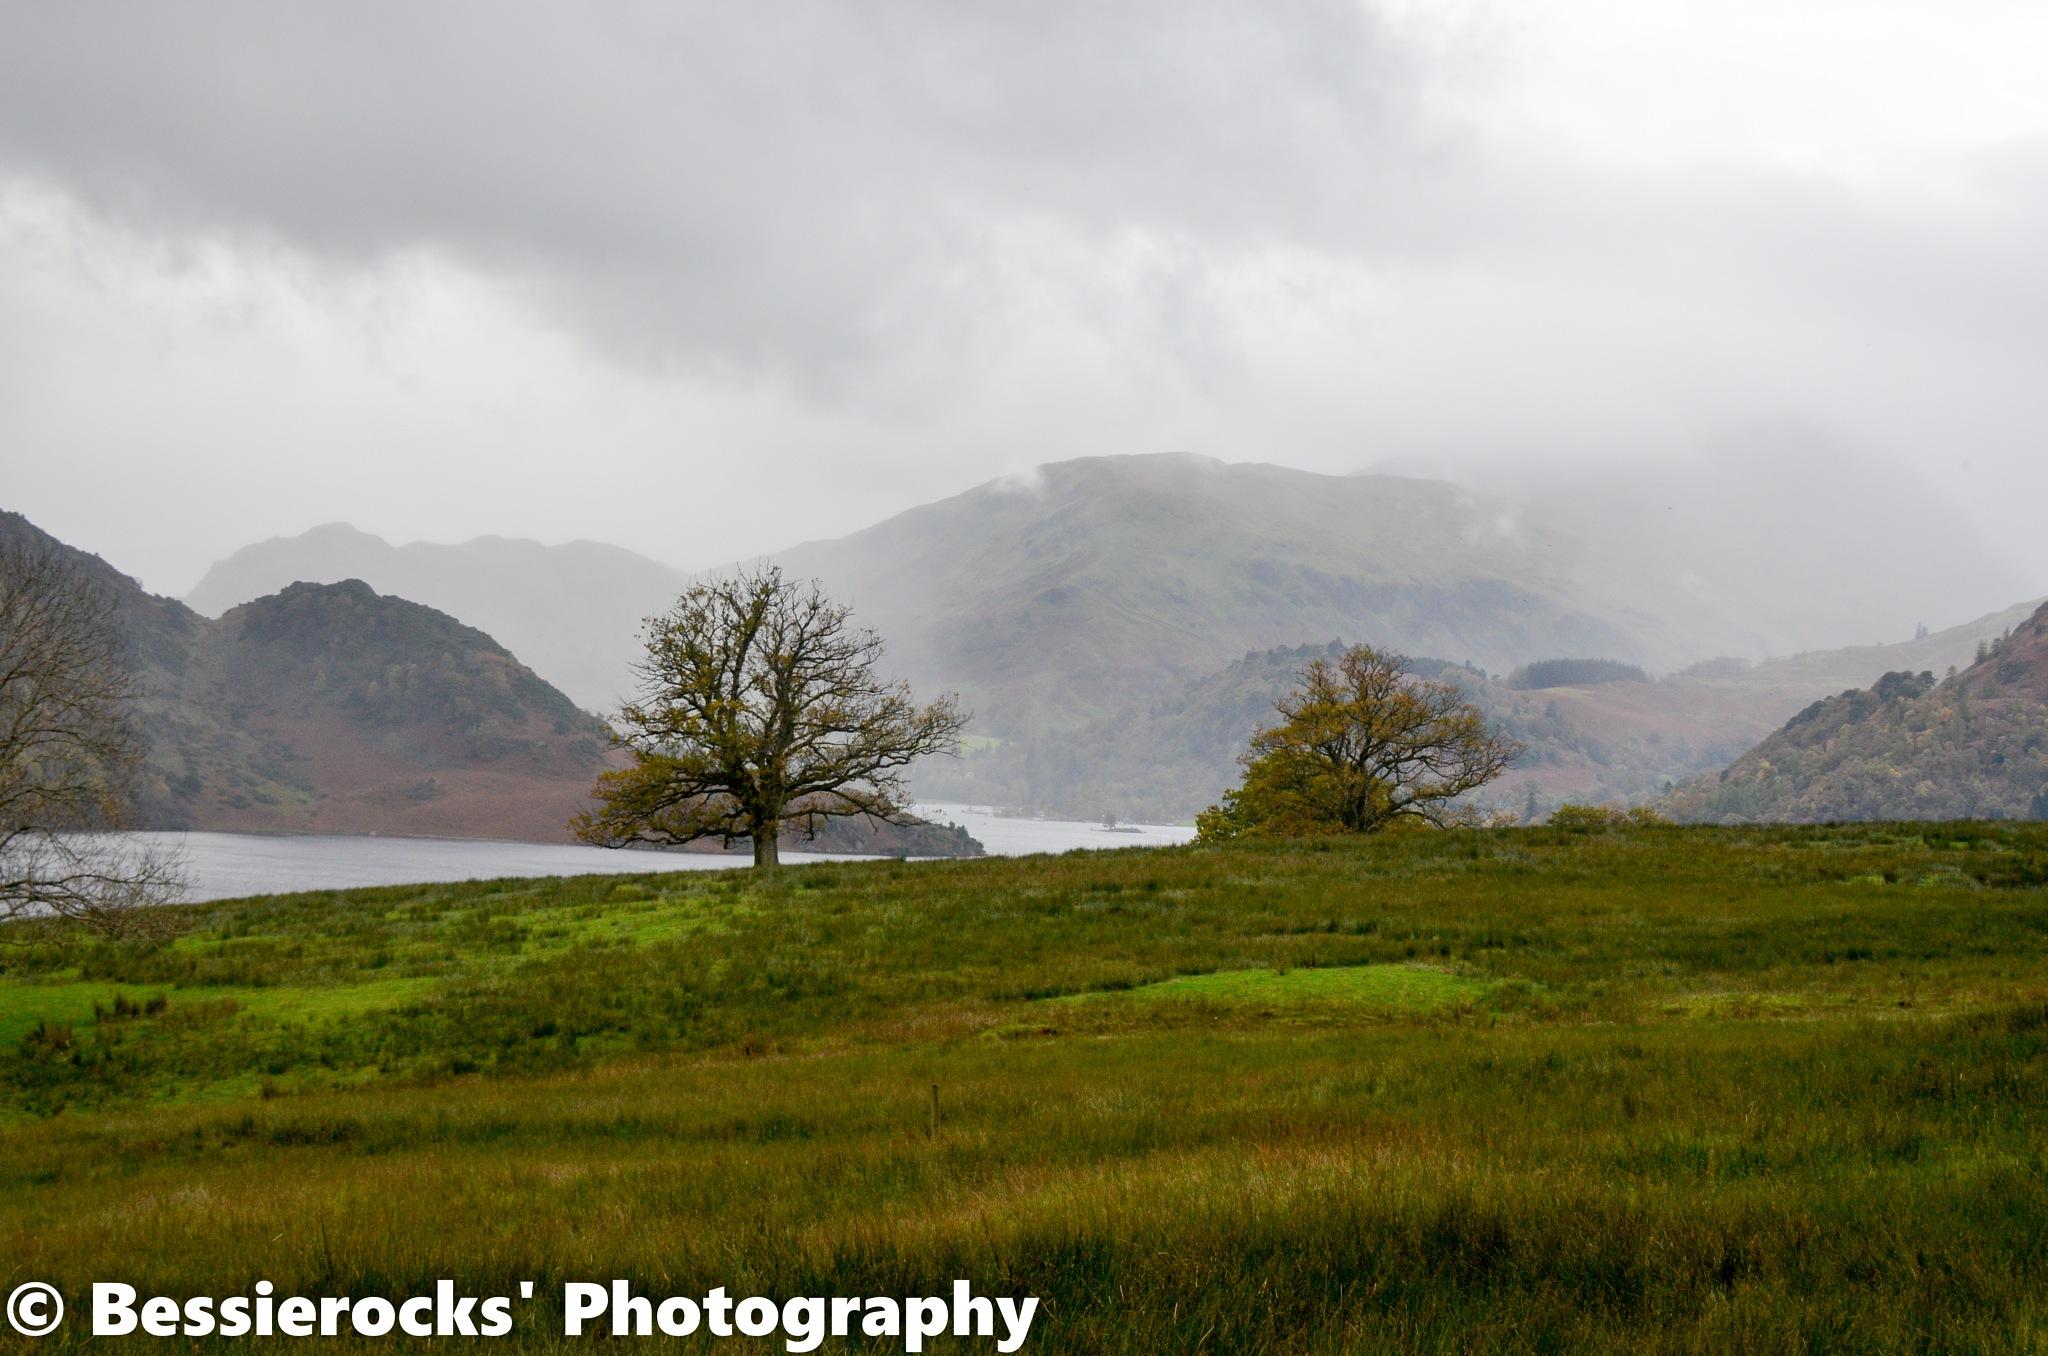 Misty Hills by Bessierocks' Photography